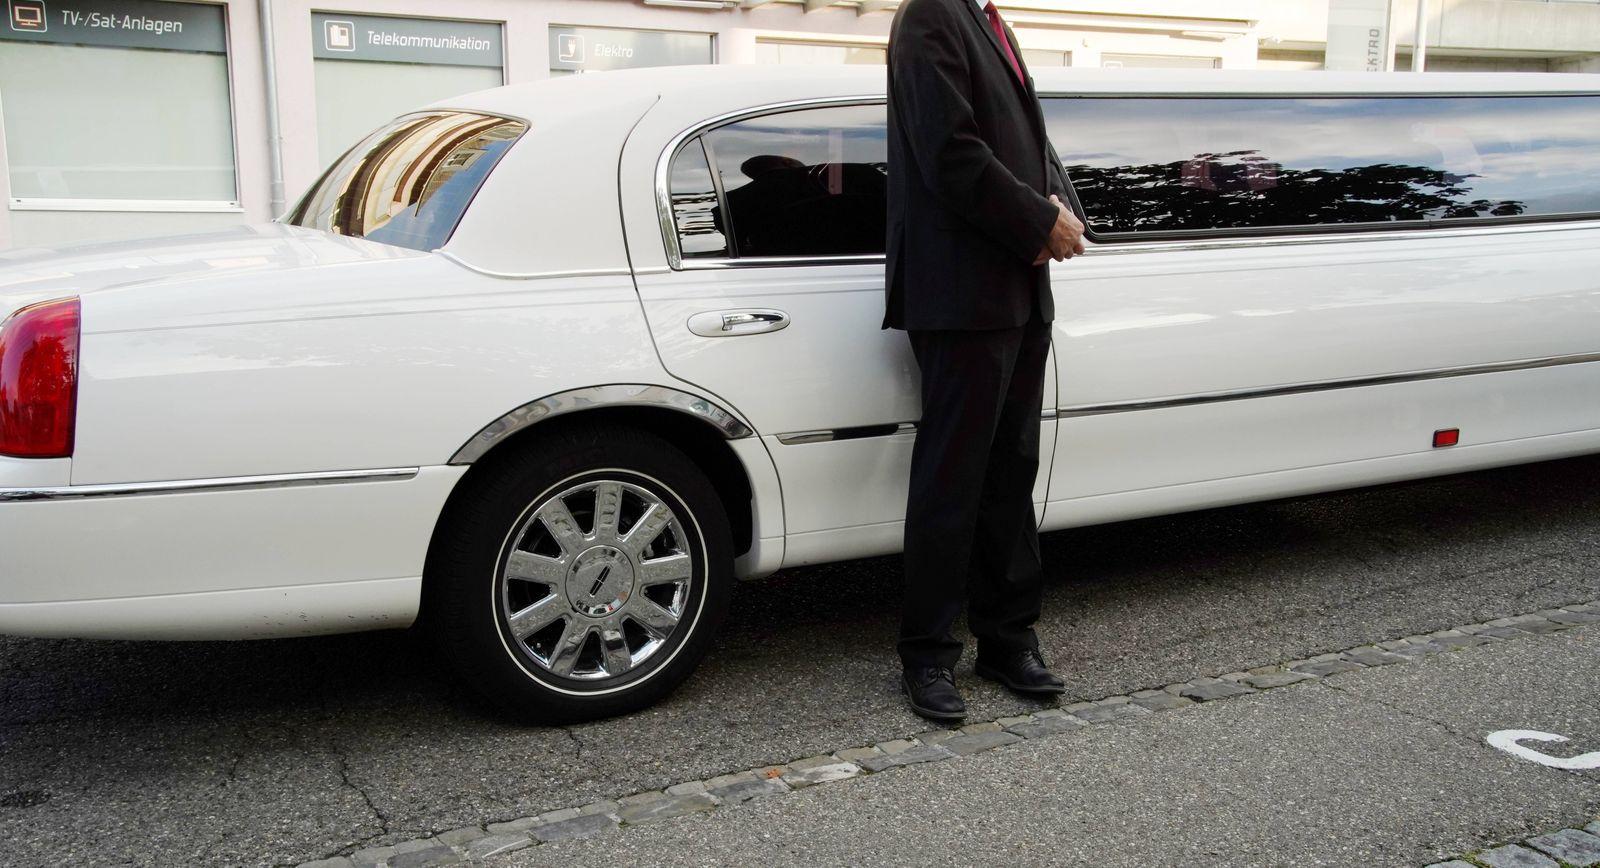 Foto Manuel Geisser 23.09.2020 Hochzeitsbranche. Privatchaffeur Stretchlimousine Business Chauffeurservice *** Photo Man